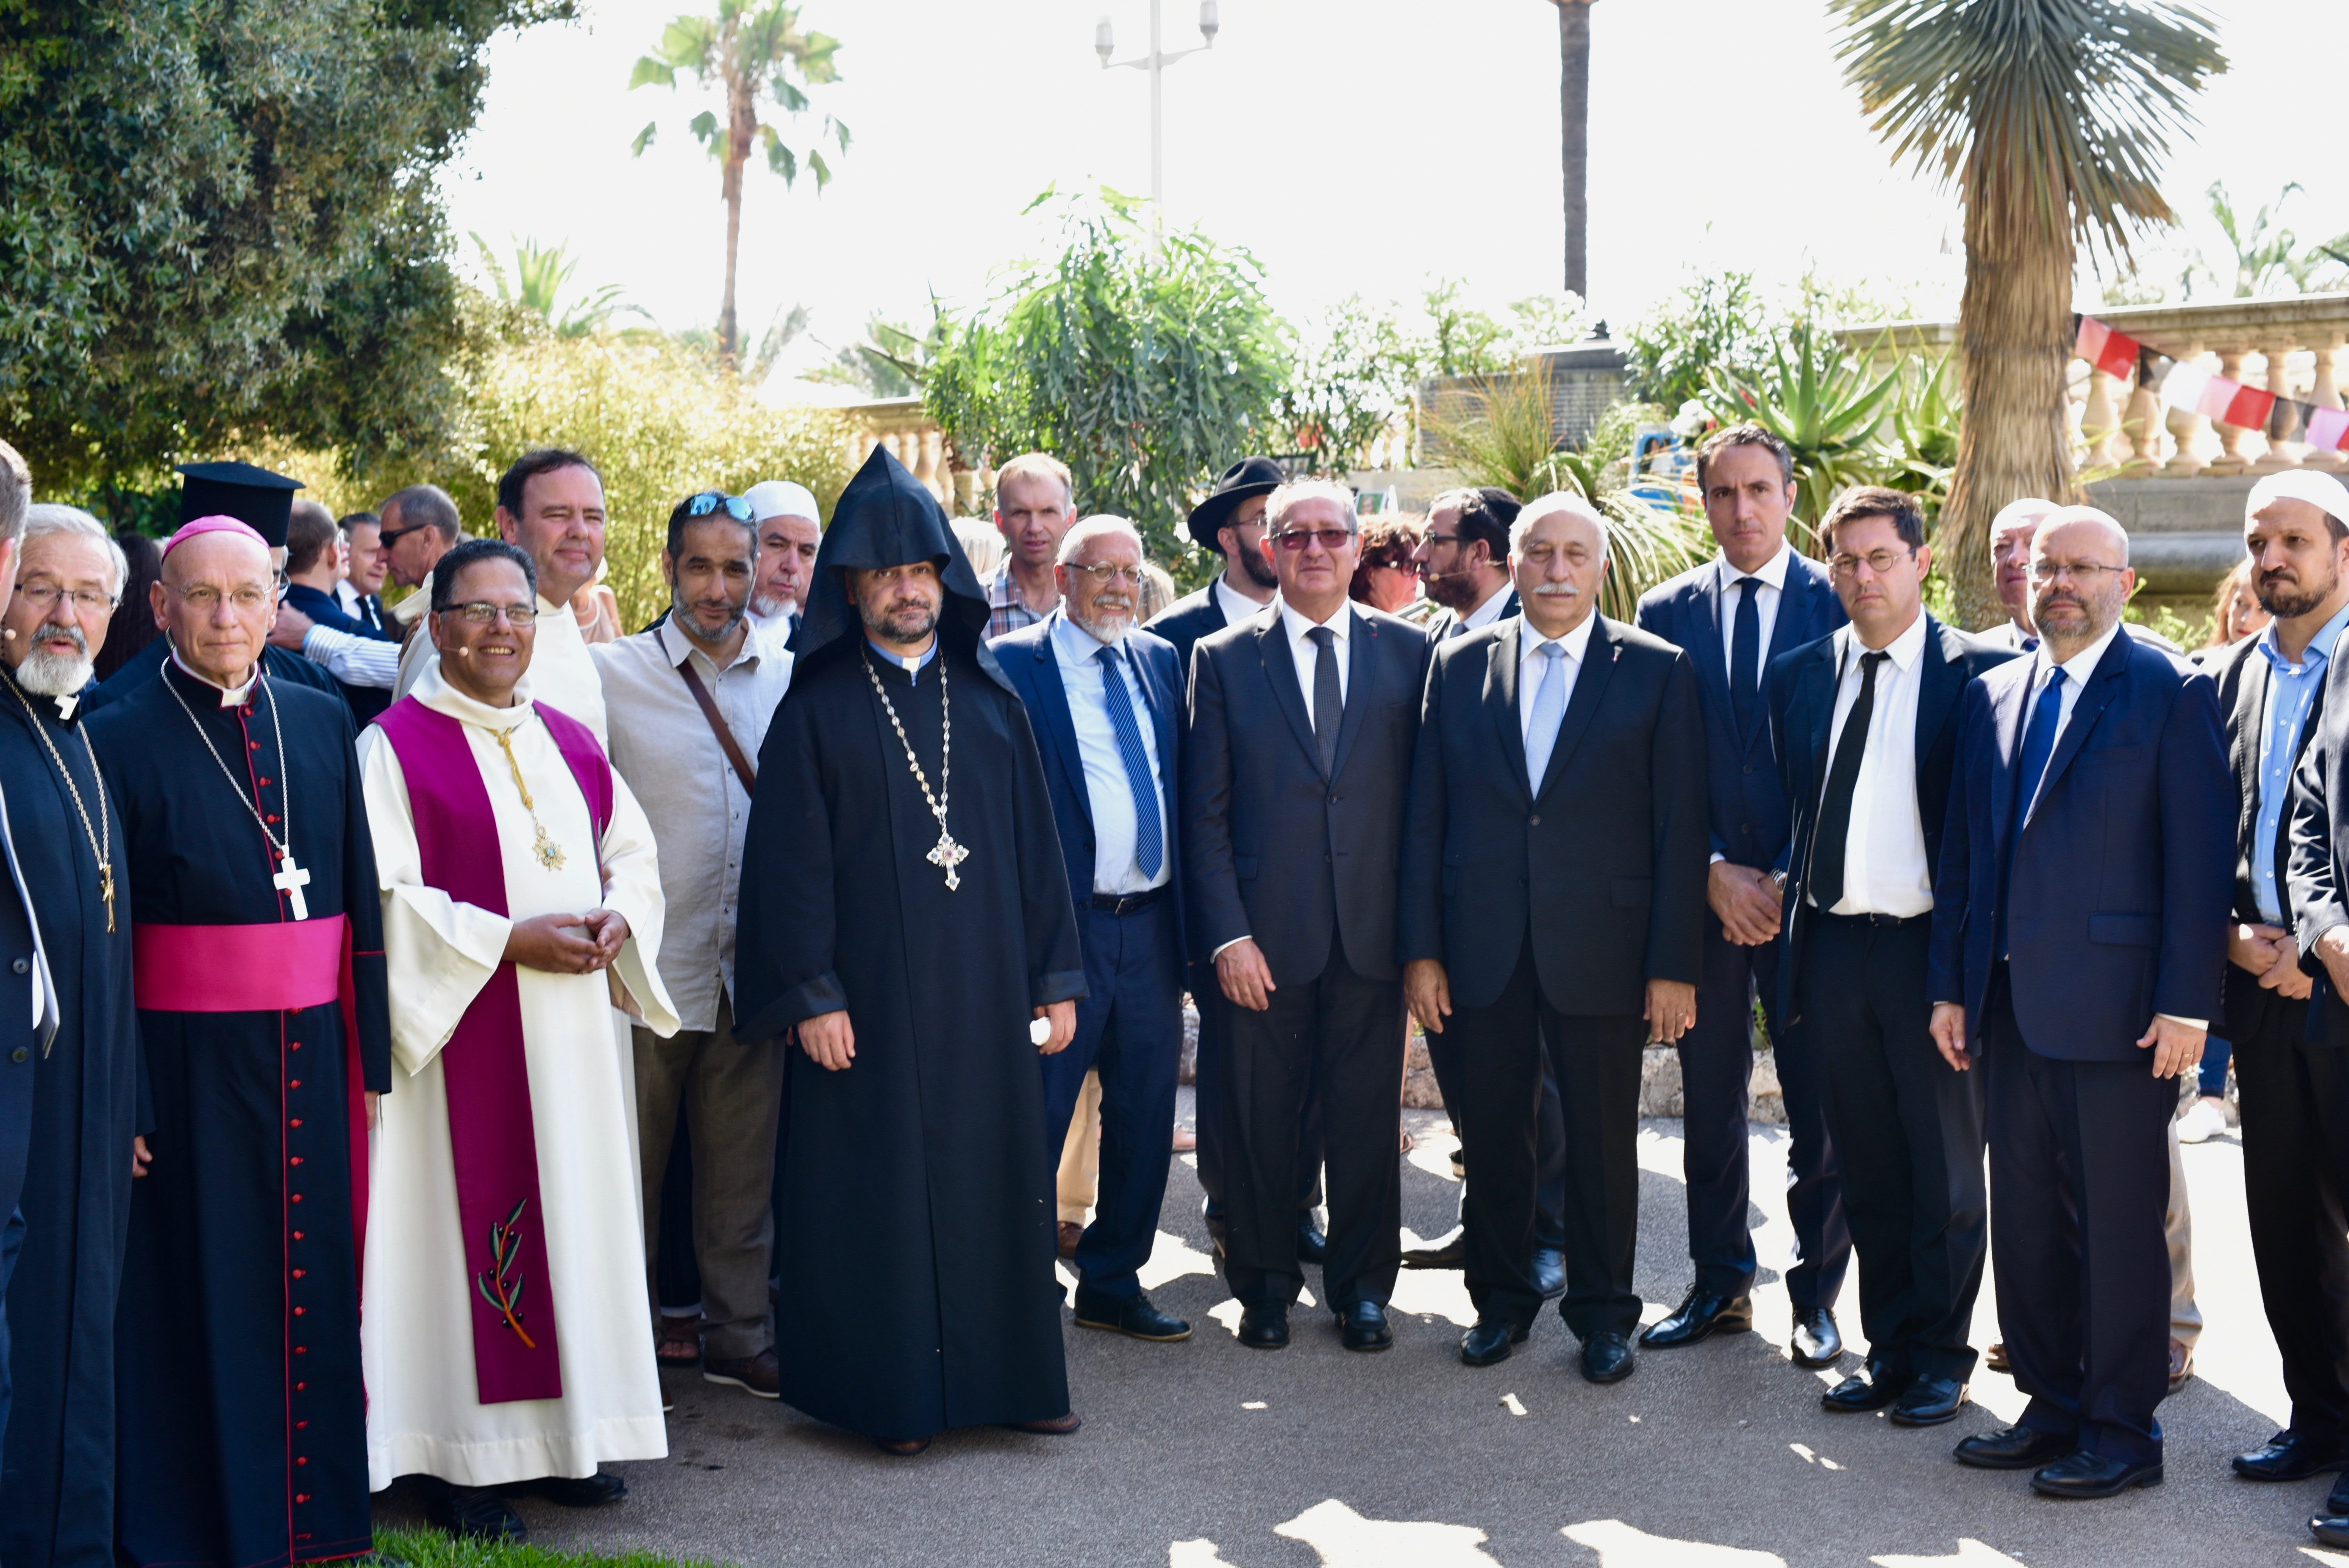 ceremonie interreligieuse a l invitation d alpes maritimes fraternite